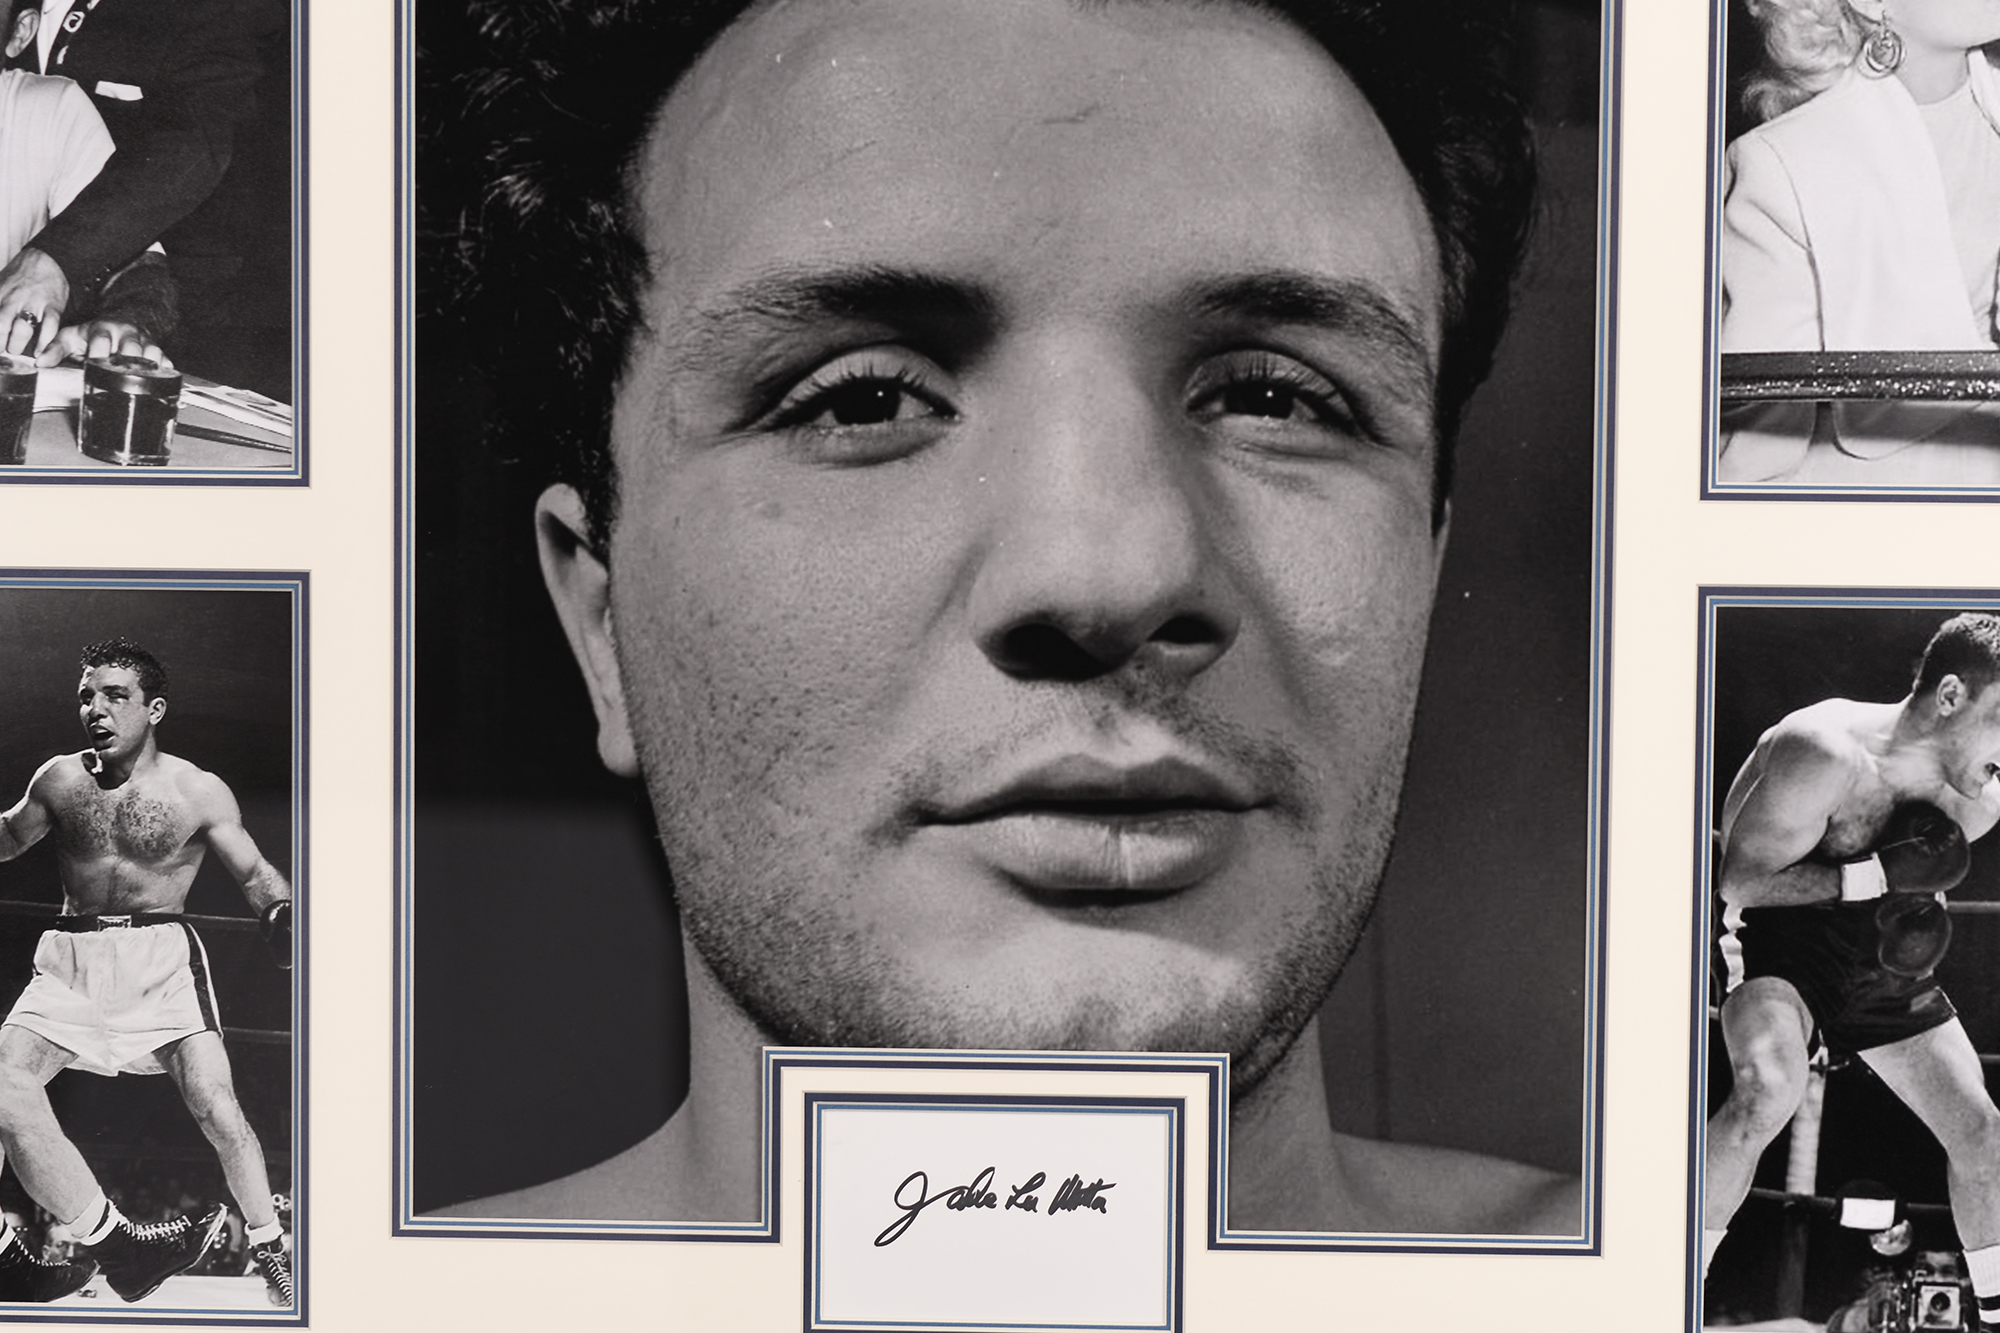 Jake Lamotta Framed Signature Presentation - Image 3 of 4